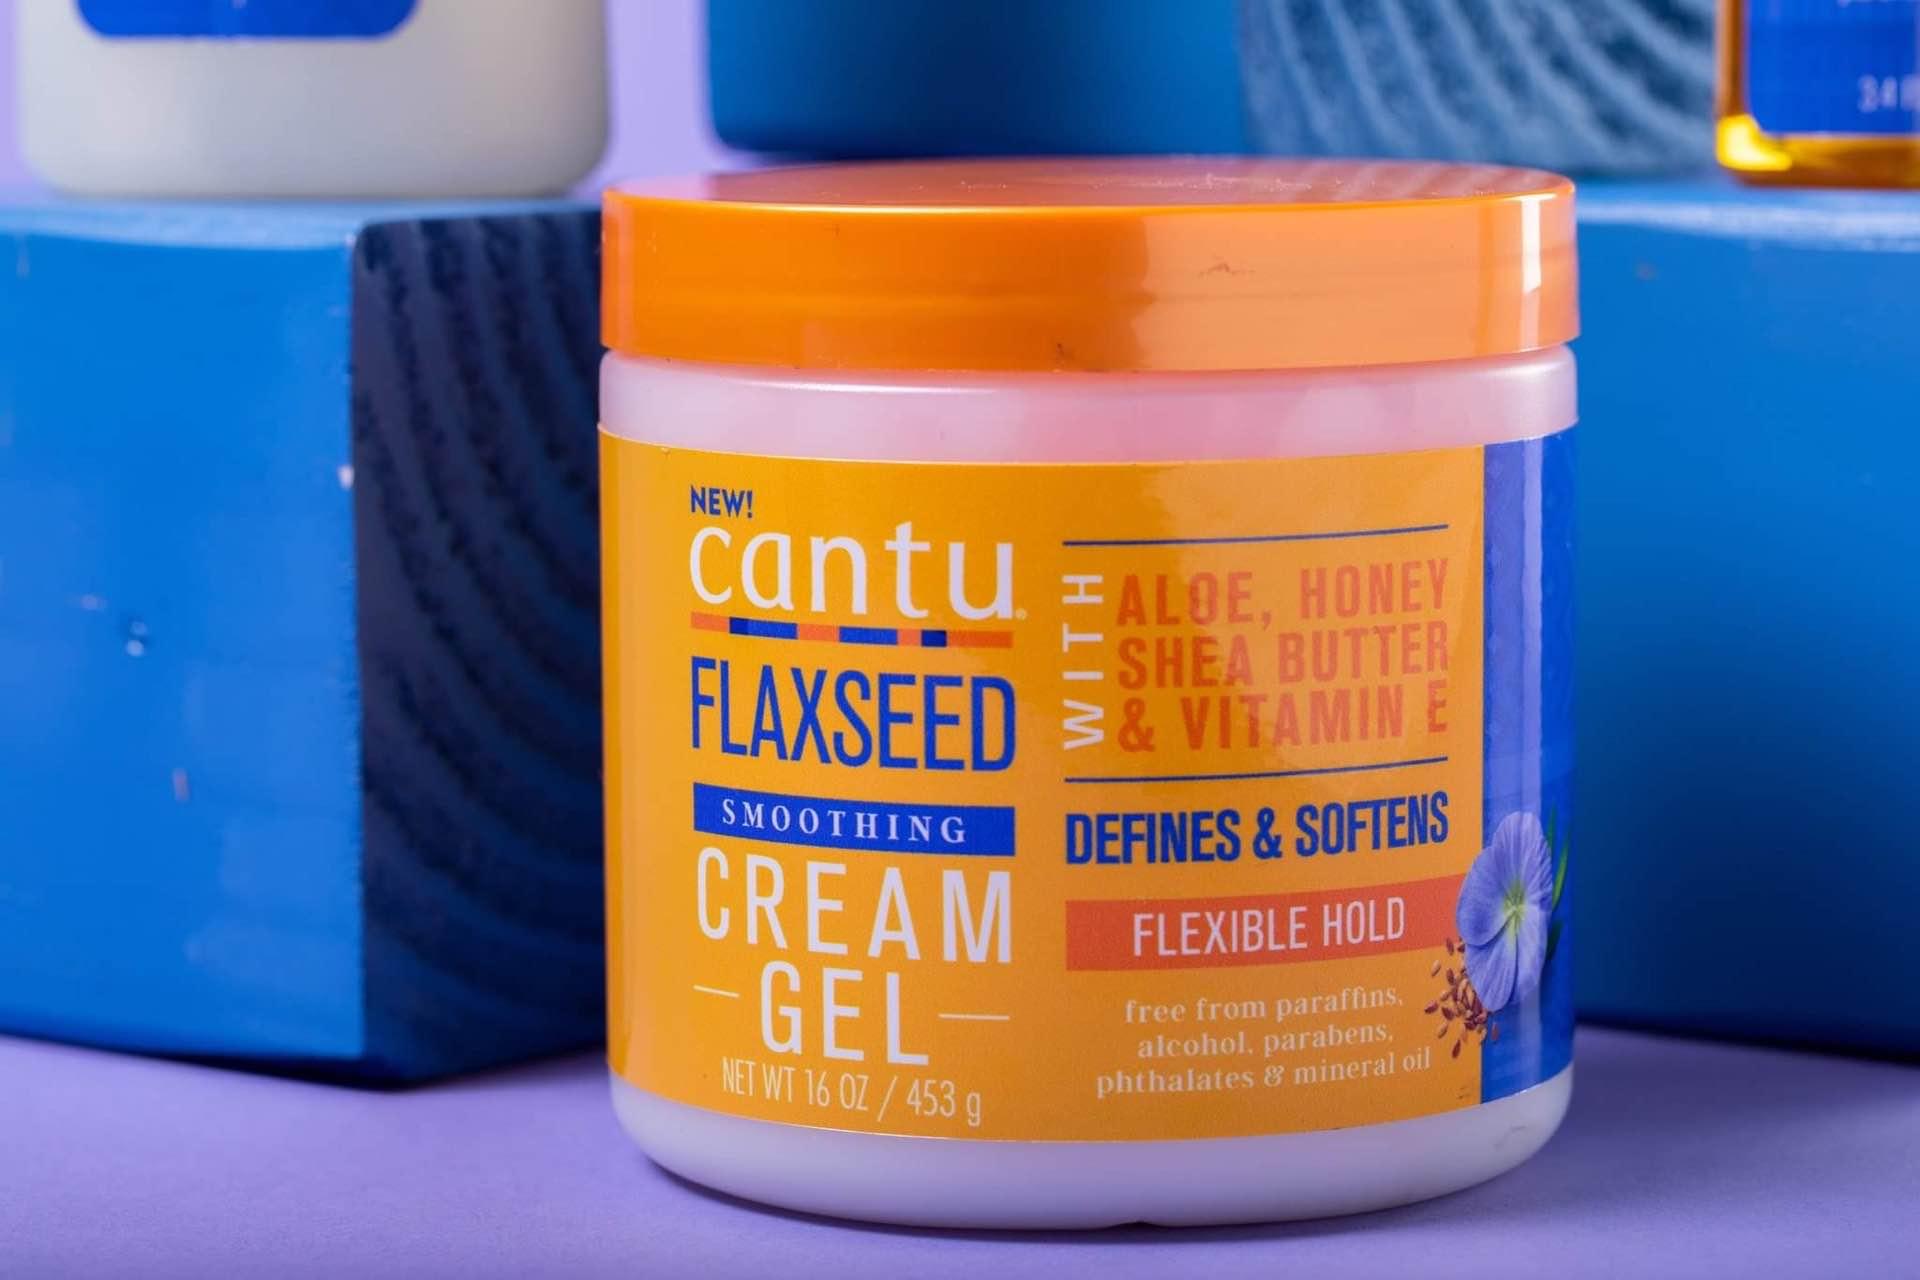 cantu-flaxseed-smoothing-cream-gel